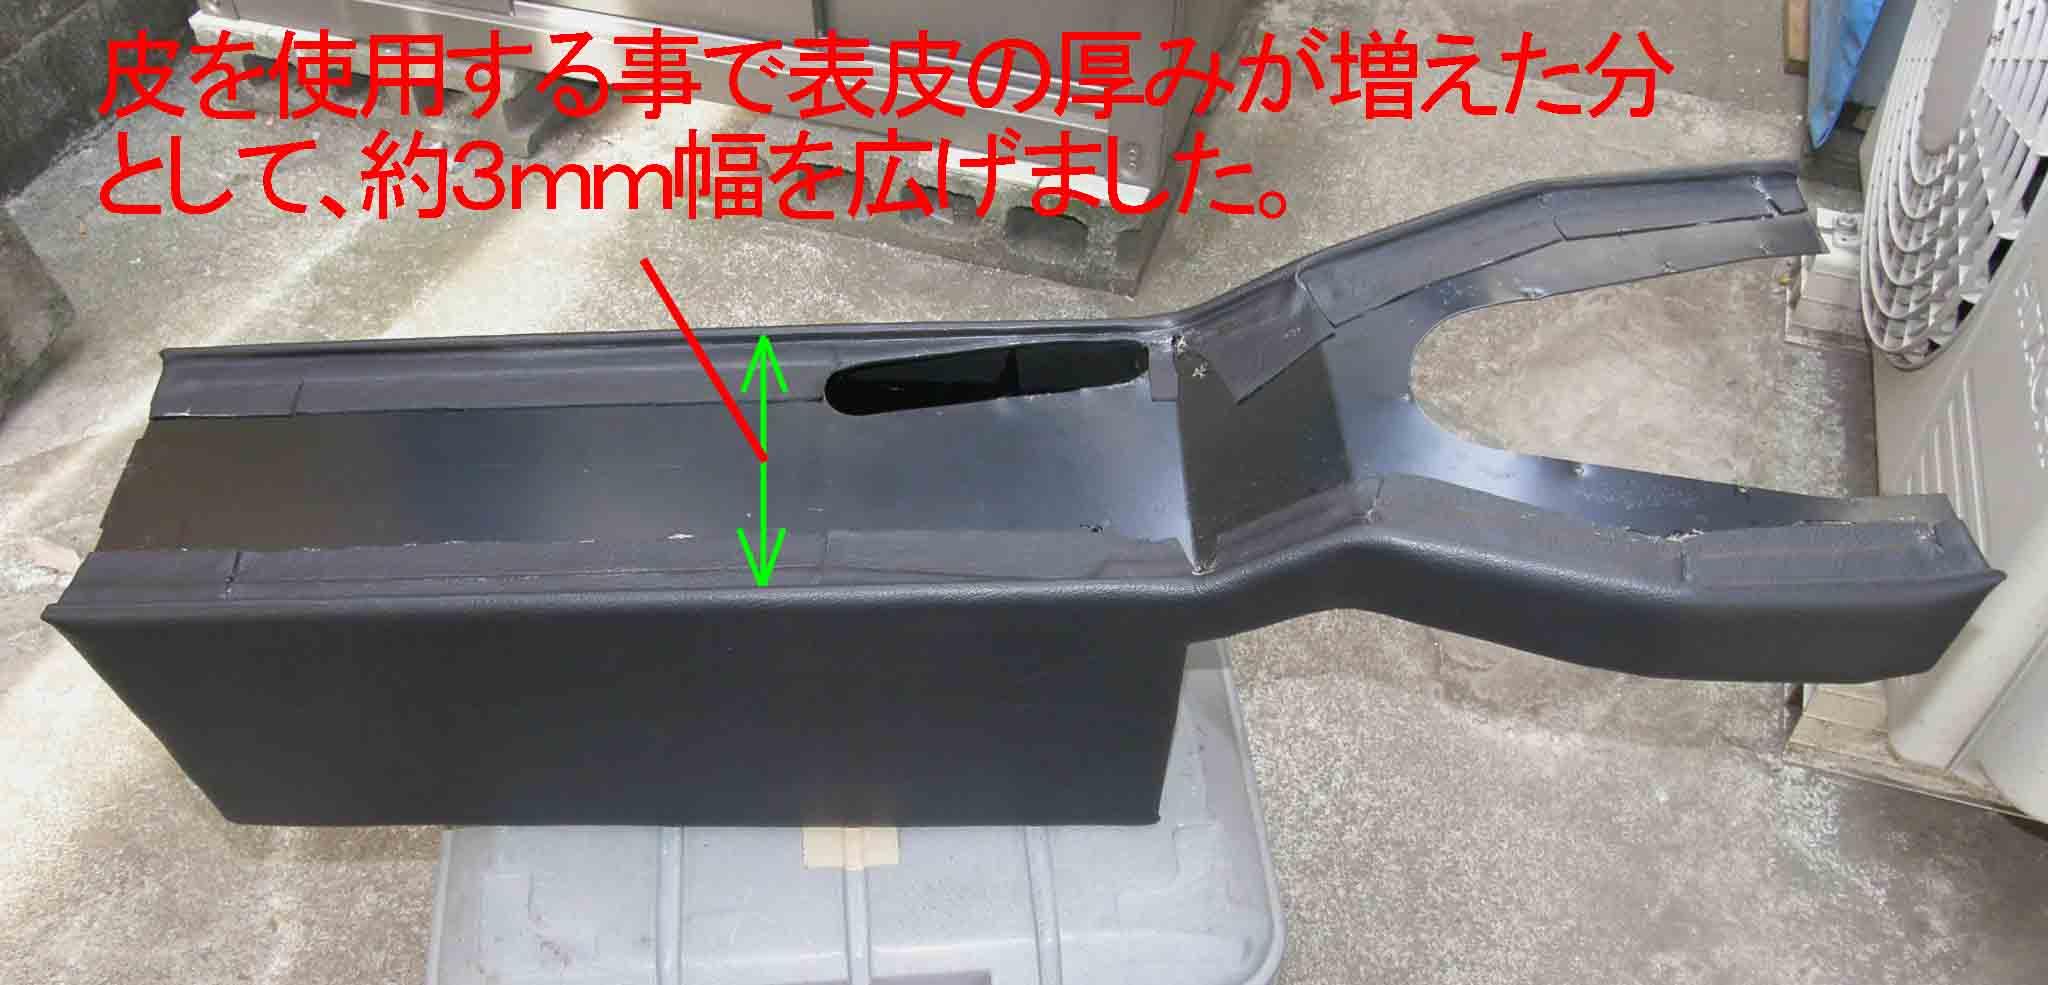 blogPC240184.jpg